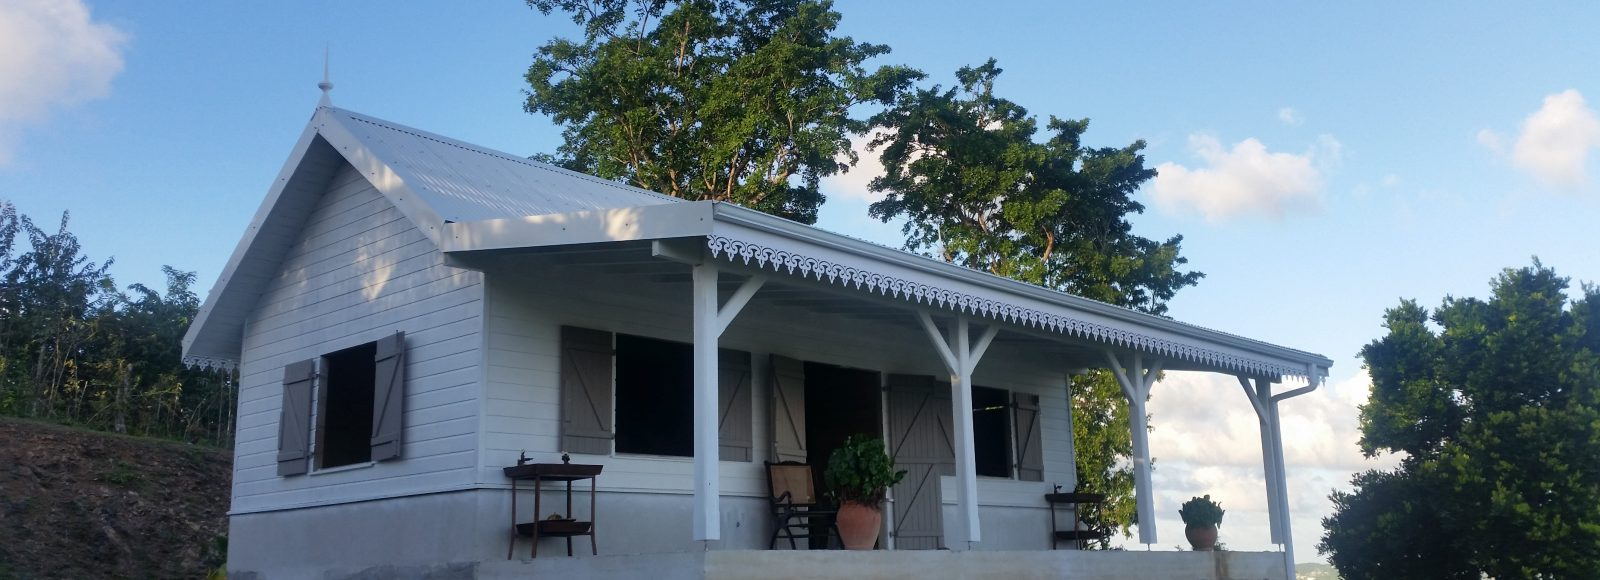 Modulotech Martinique - Constructions Bois - Maisons Bois ... serapportantà Maison En Kit Martinique